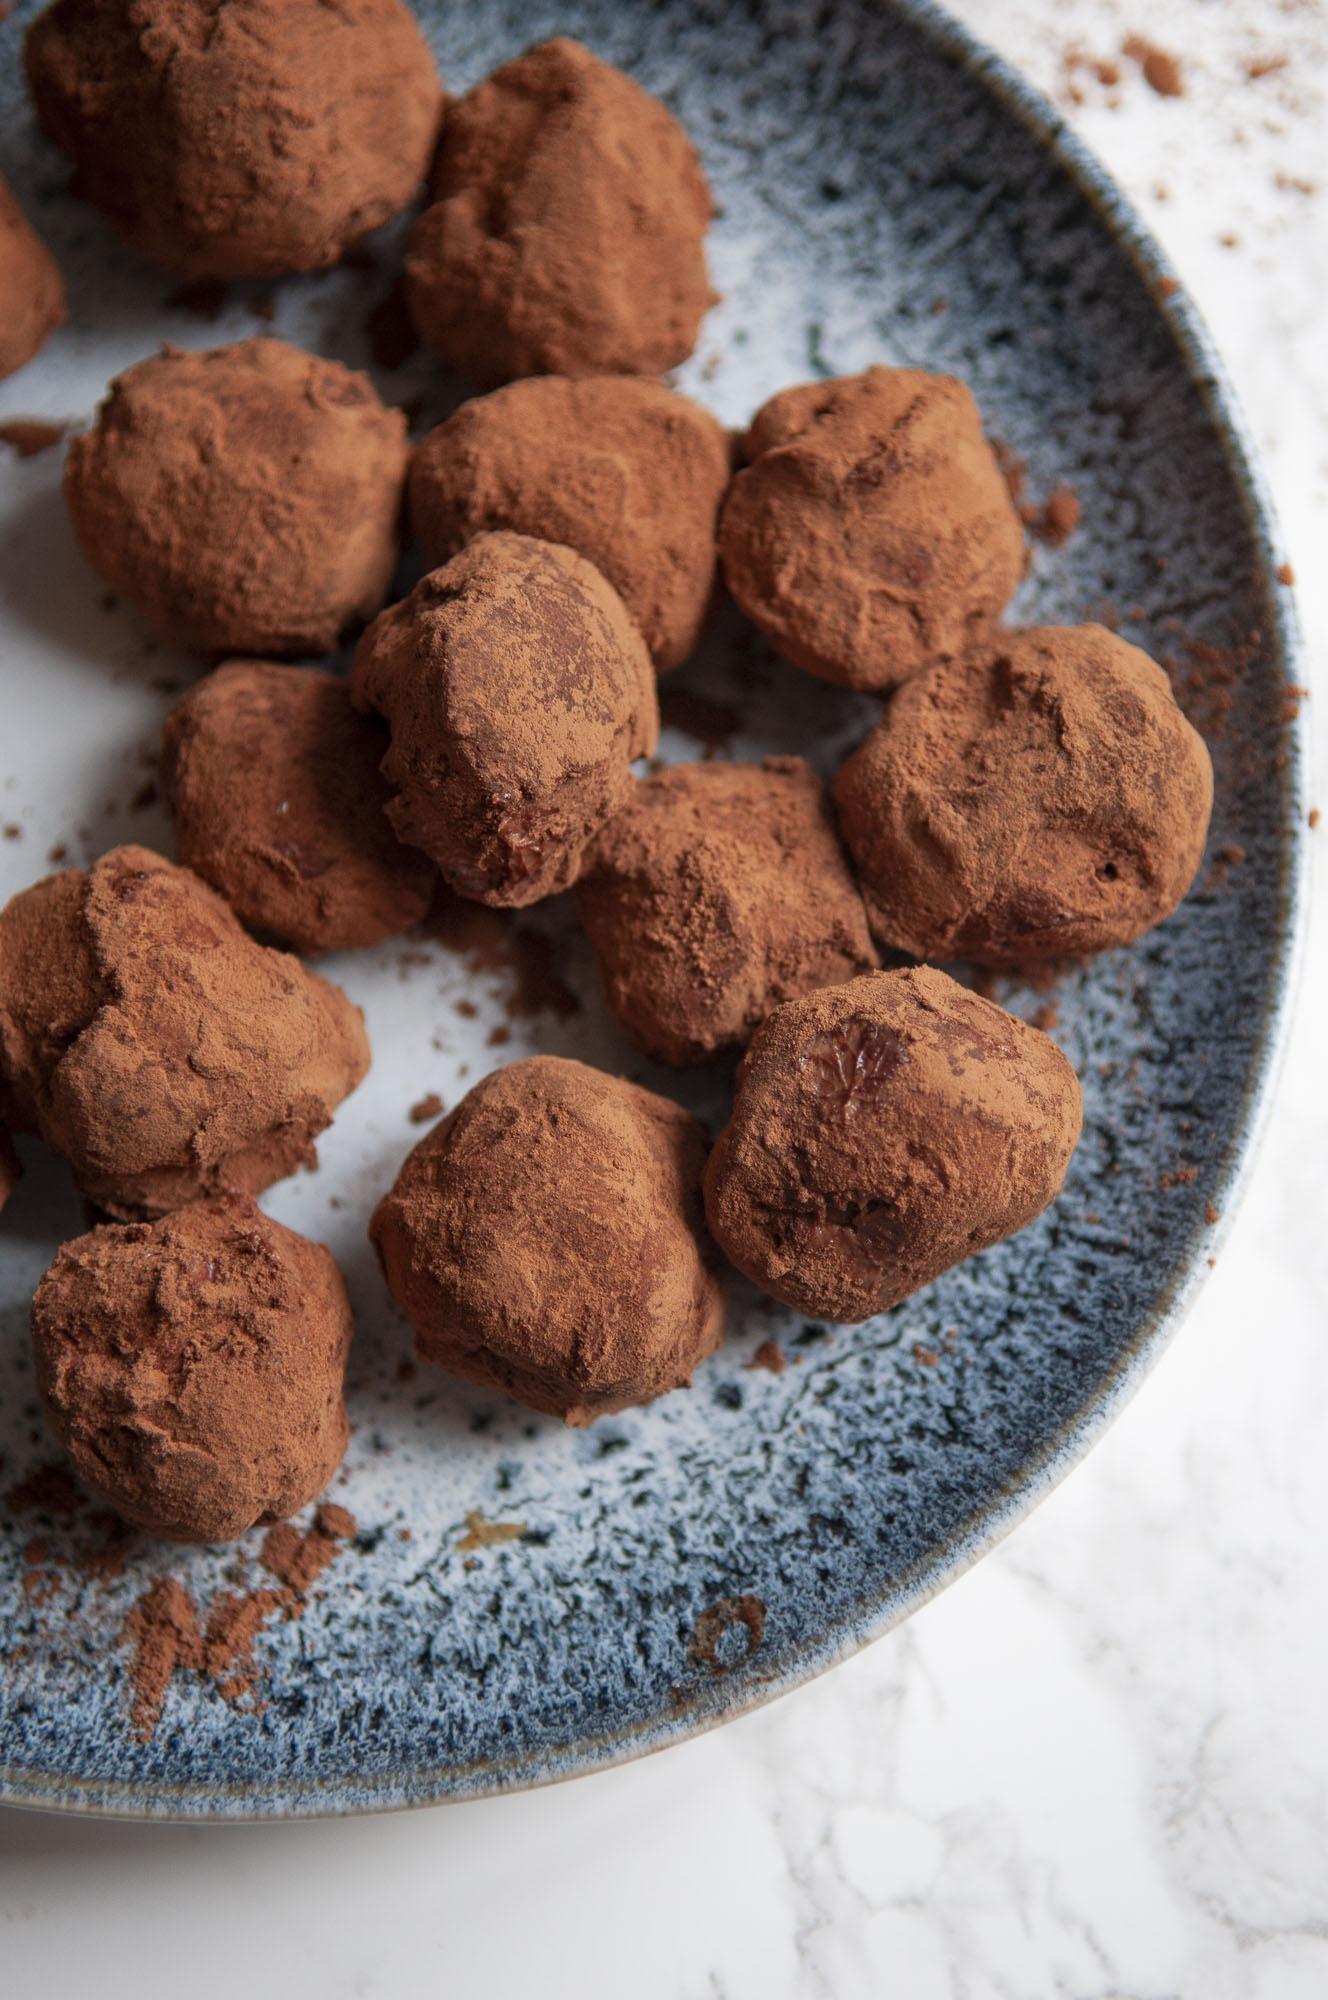 Les truffes au chocolat keto